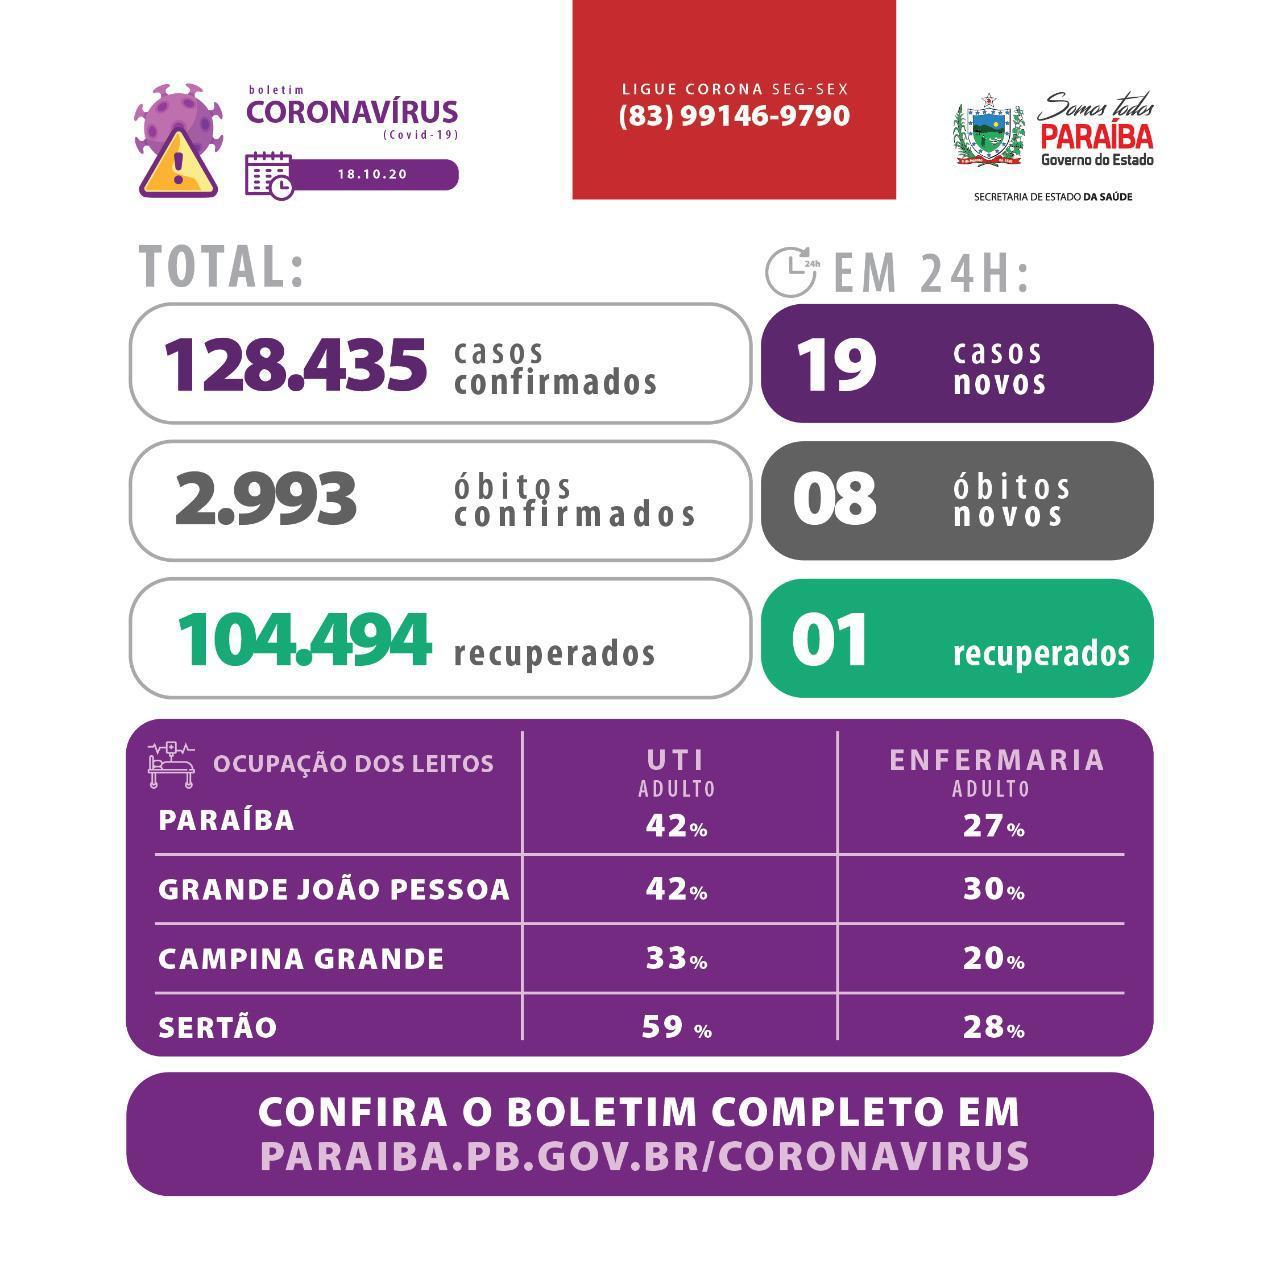 WhatsApp Image 2020 10 18 at 15.42.49 - BOLETIM EPIDEMIOLÓGICO: Paraíba registra 01 óbito por Covid-19 nas últimas 24h